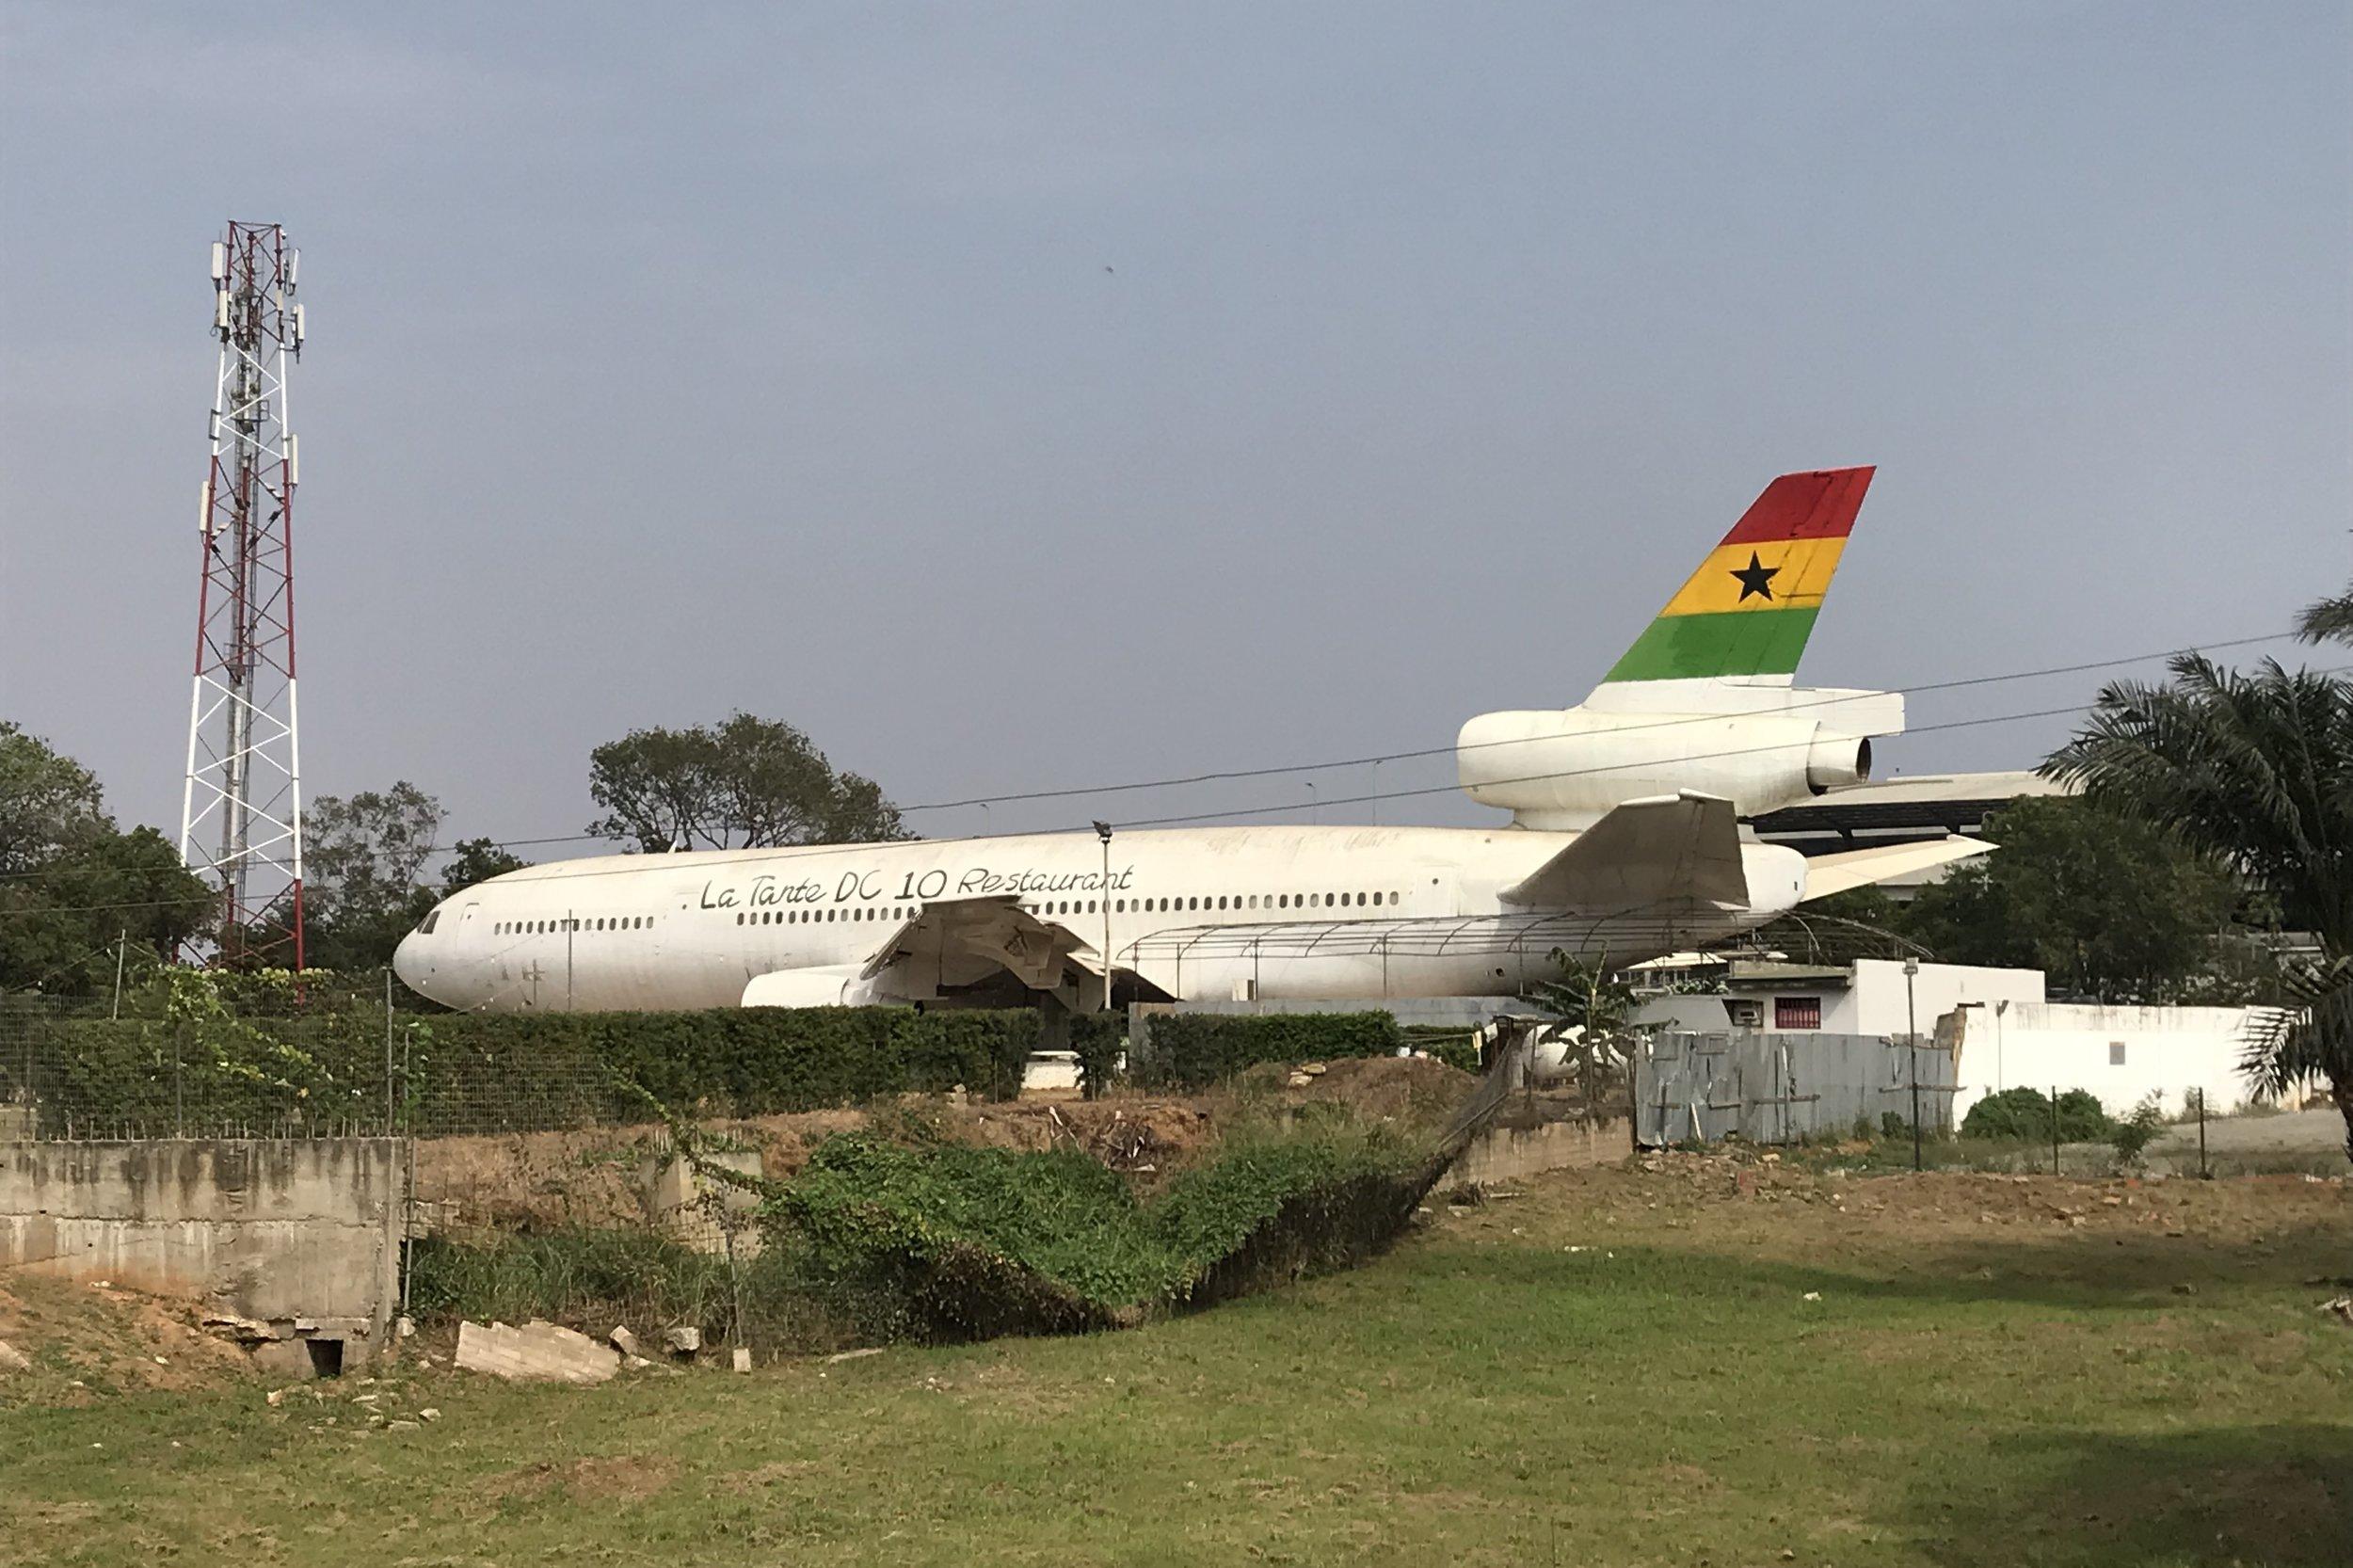 La Tante DC-10 Restaurant – Exterior